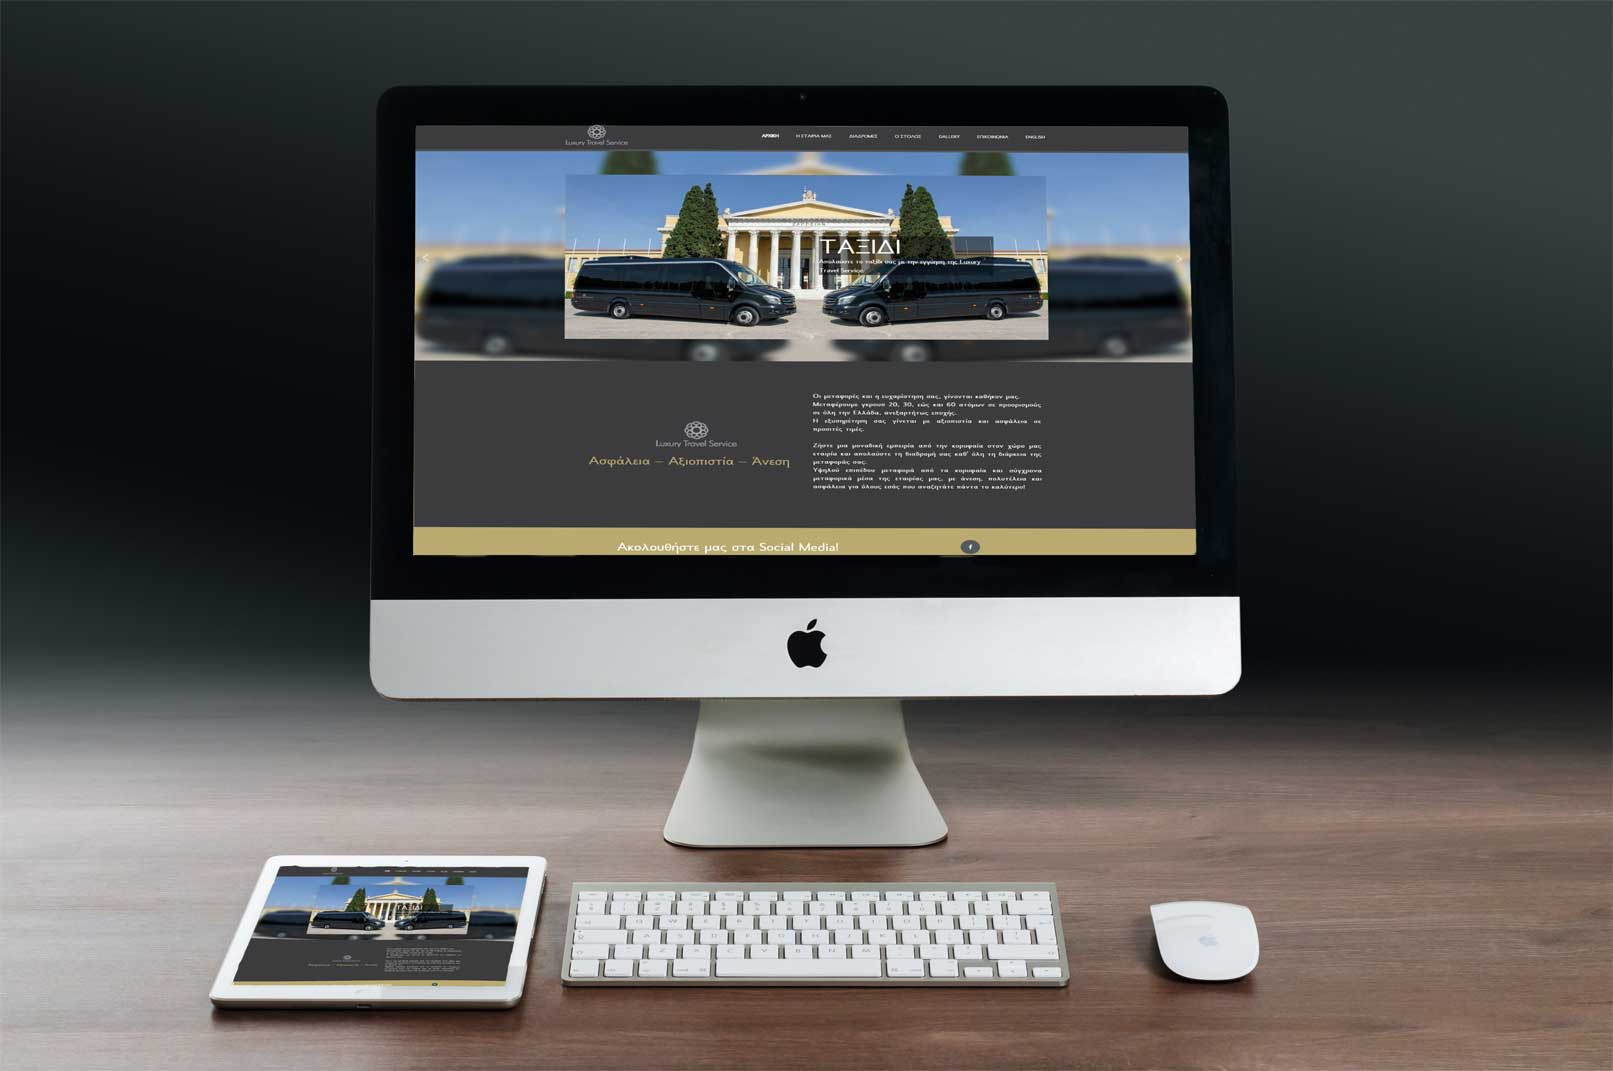 Kατασκευή ιστοσελίδας luxurytravelservice.gr